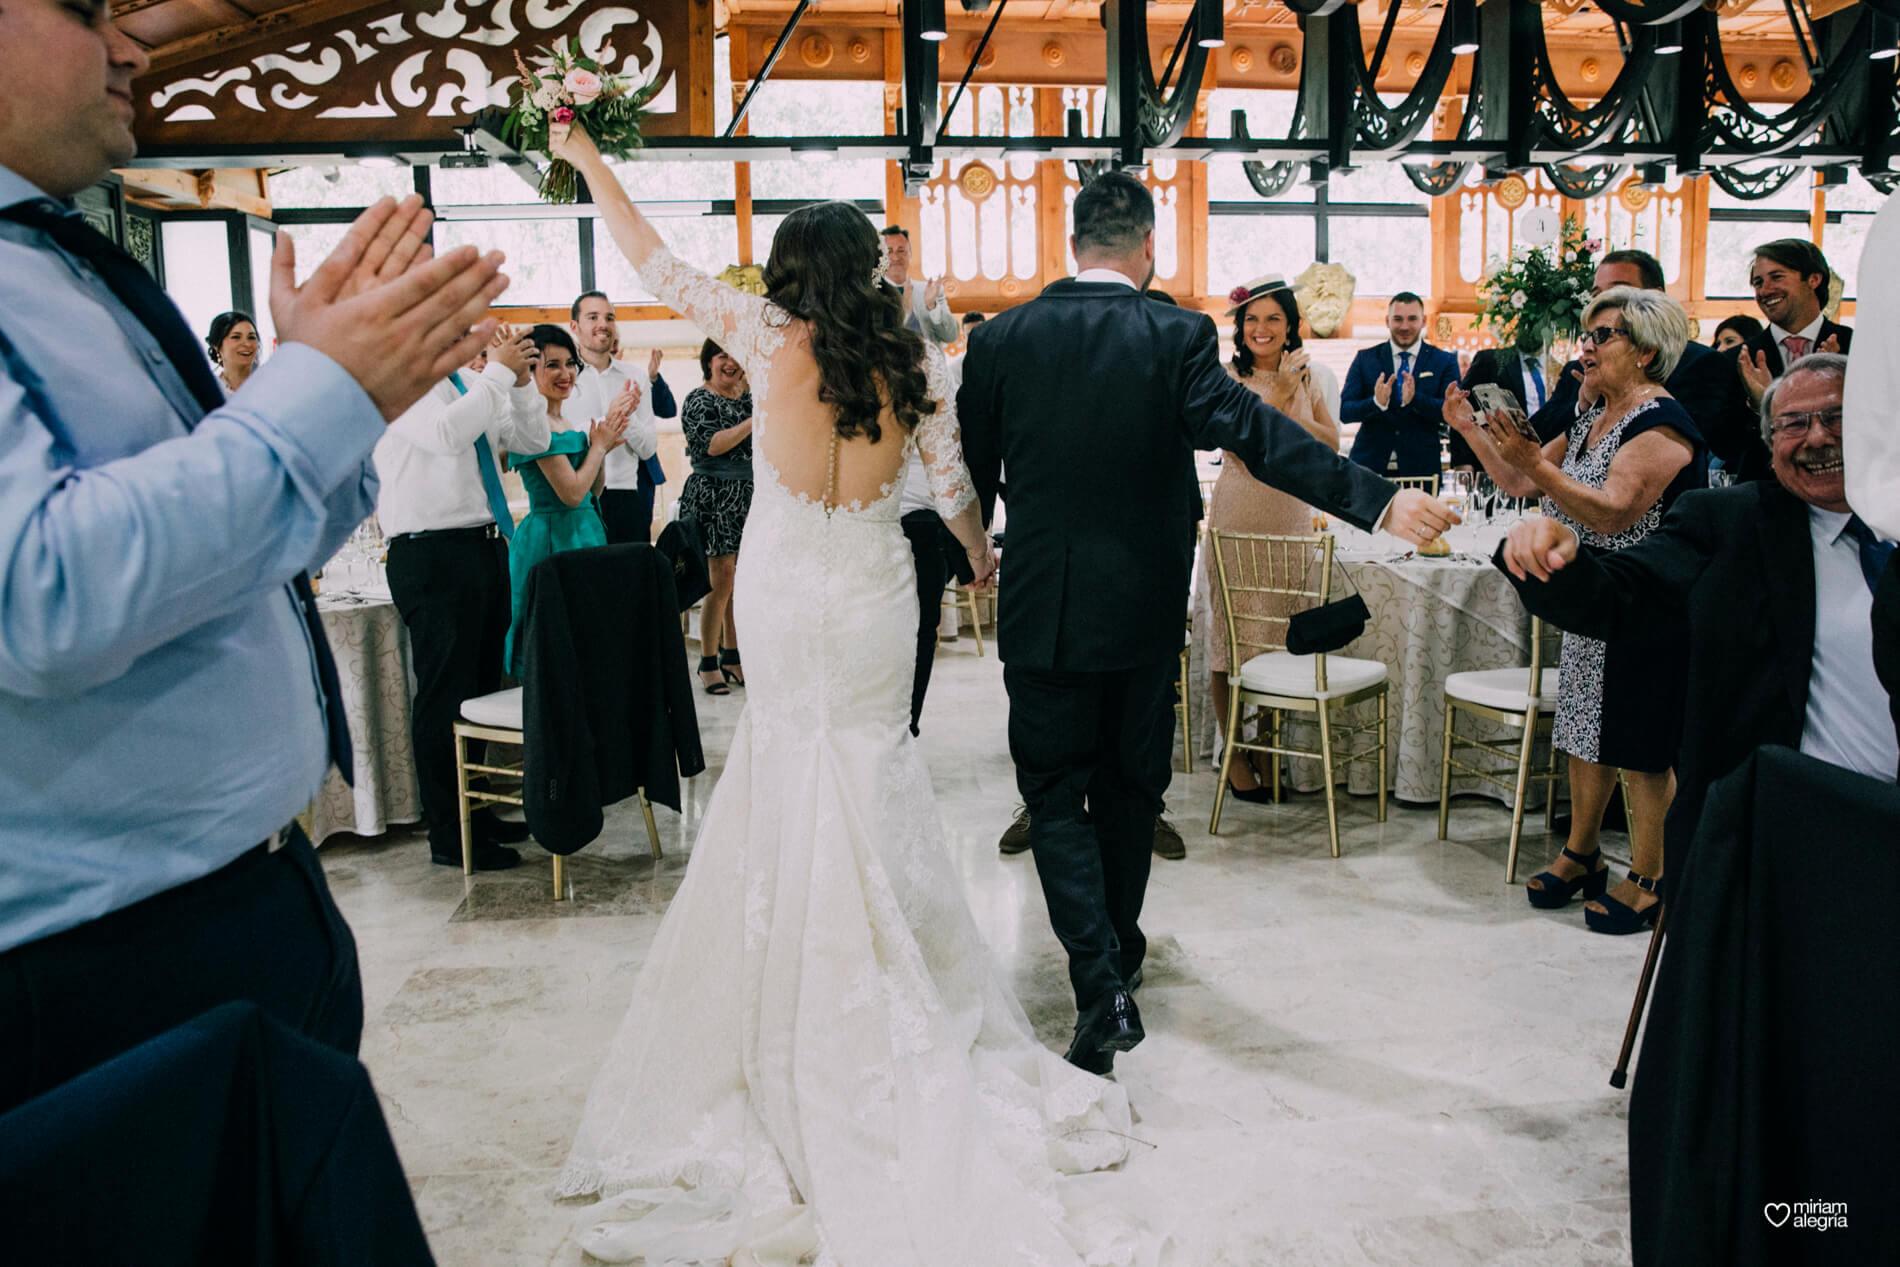 boda-en-finca-jurosa-miriam-alegria-102